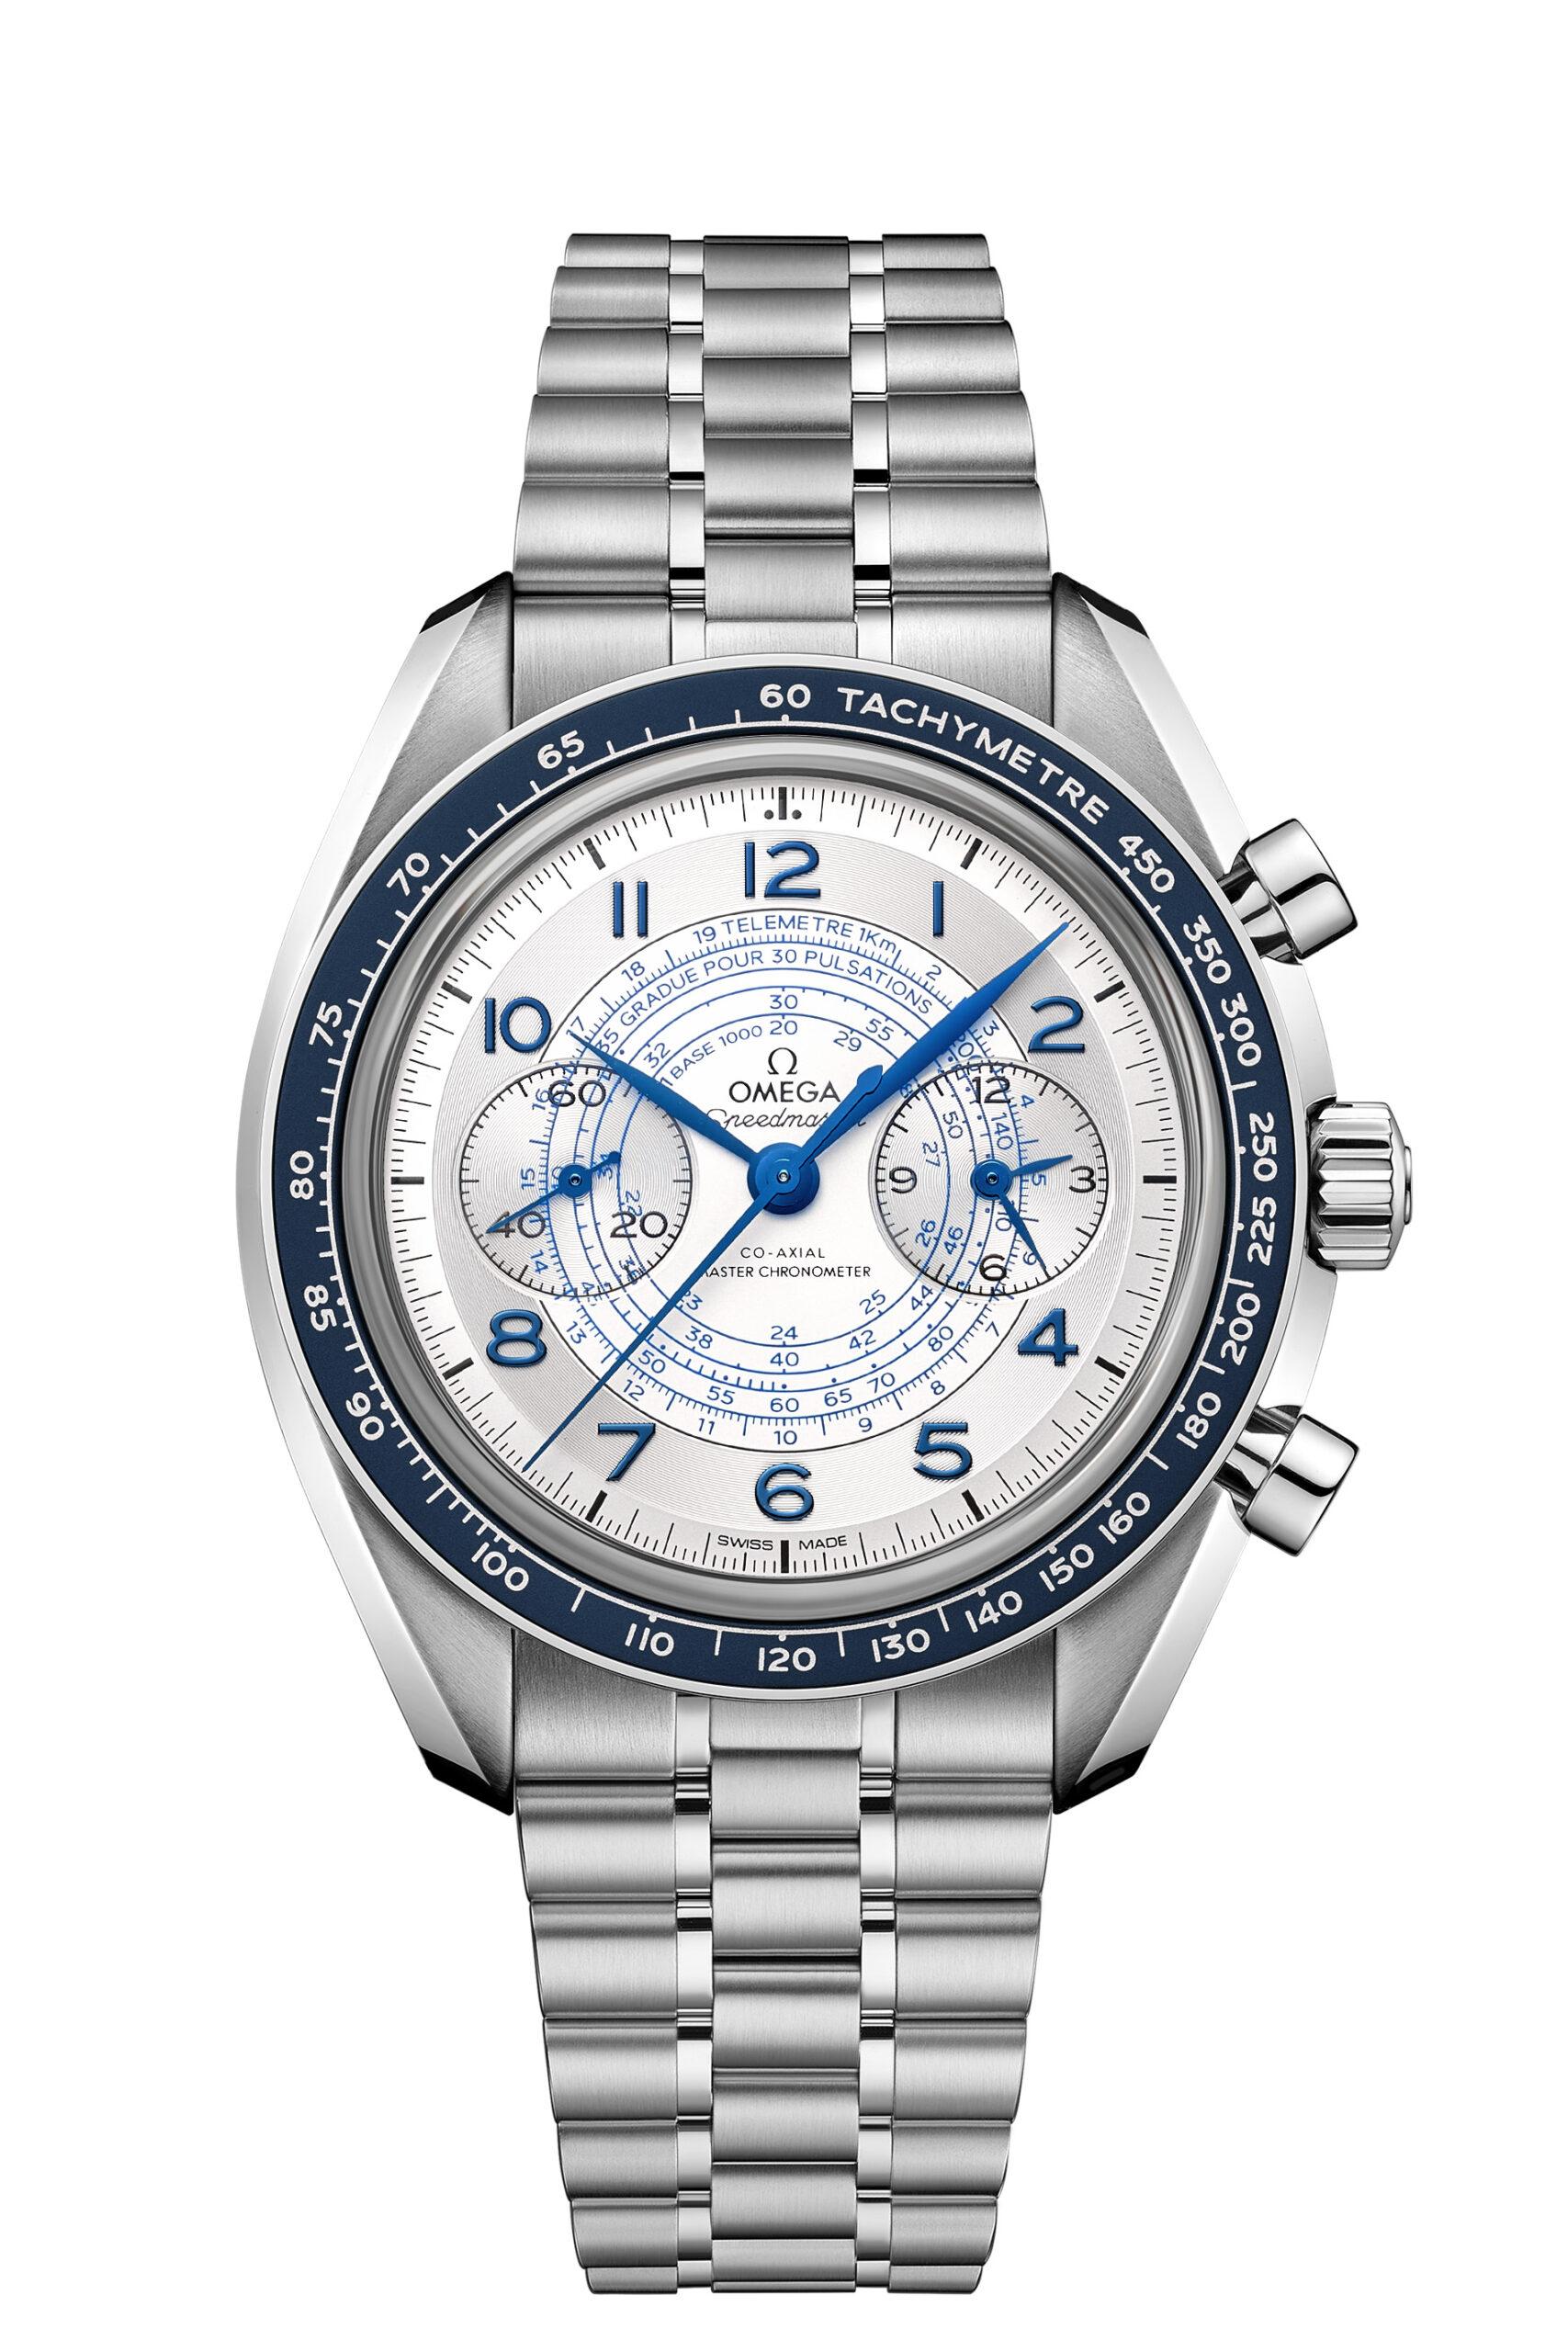 Speedmaster Chronoscope with silver white dial on bracelet